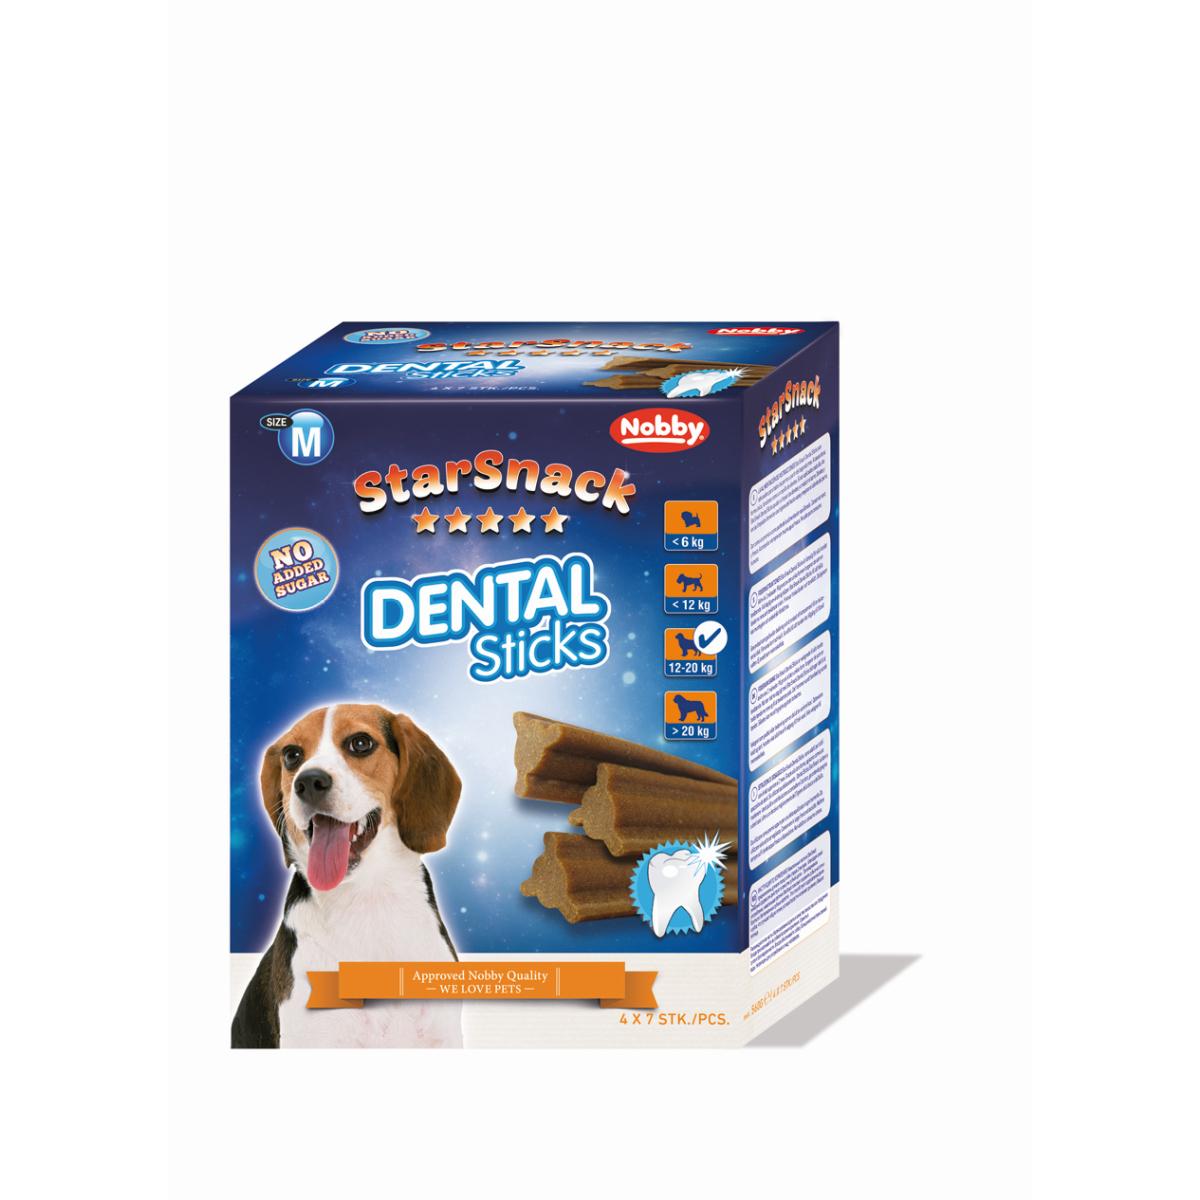 Nobby - starsnack dental sticks 609 gr